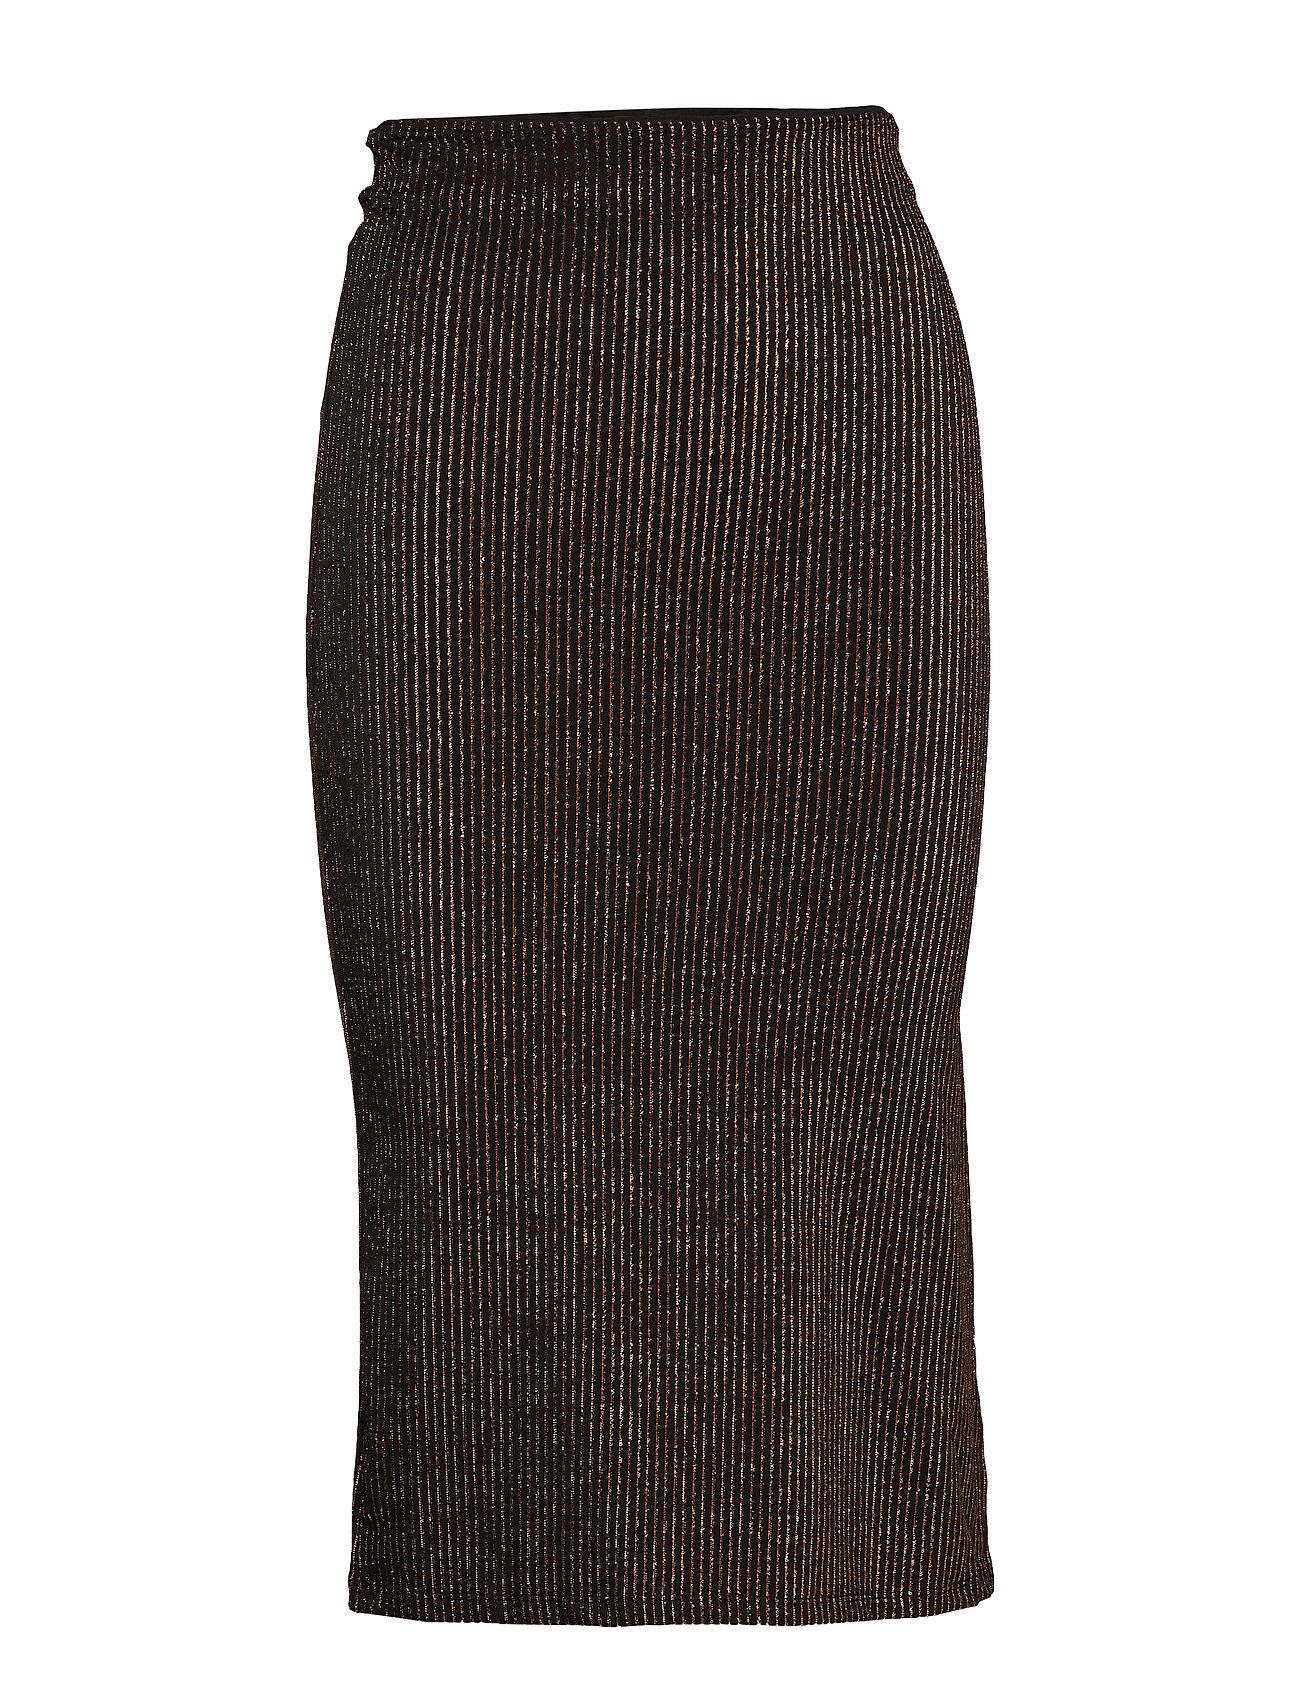 Soaked in Luxury Slmya Skirt Polvipituinen Hame Musta Soaked In Luxury